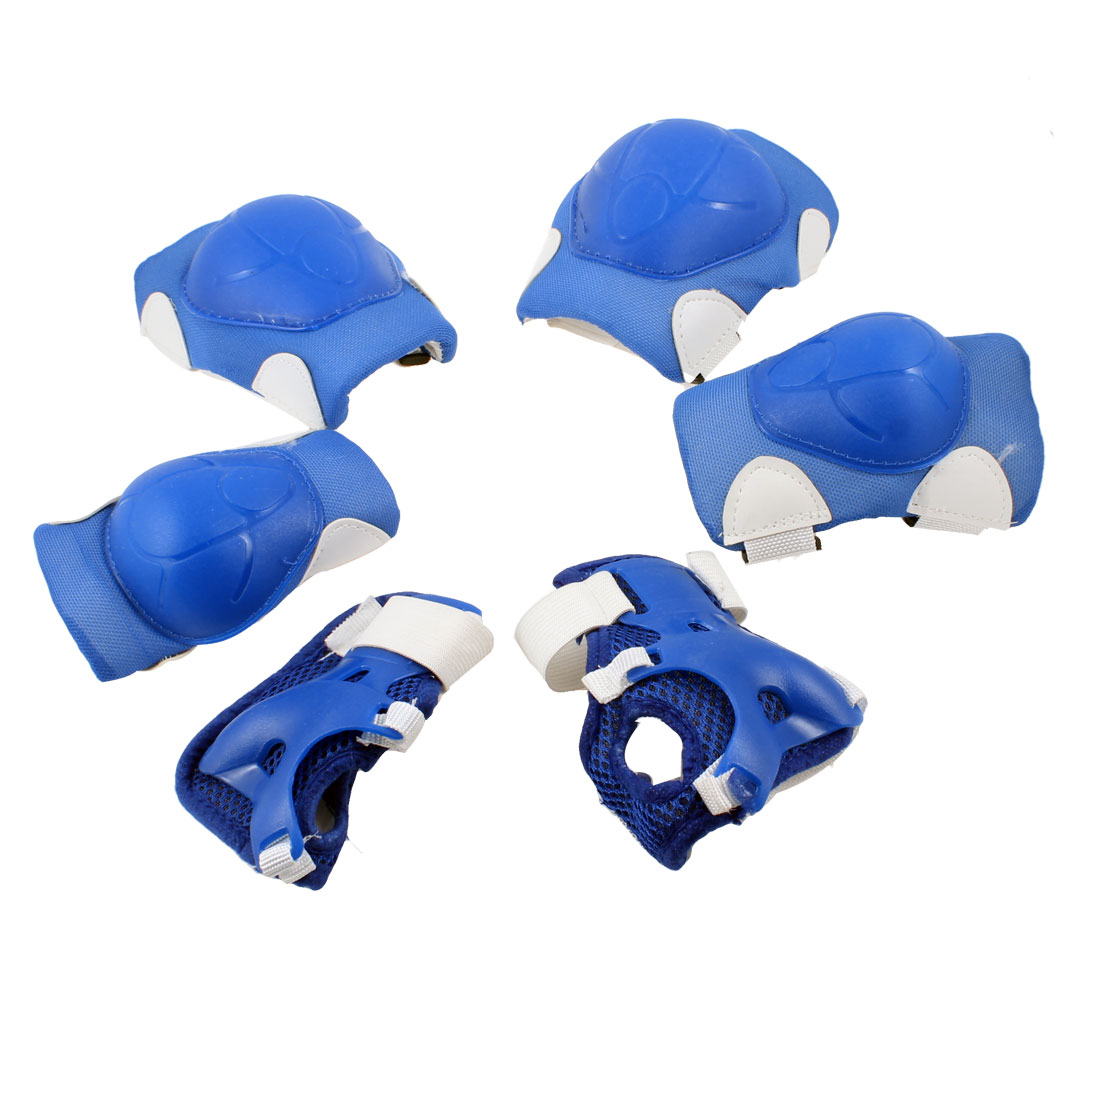 Children Kids Blue White Wrist Elbow Knee Pad Skate Sports Support 3 Pairs